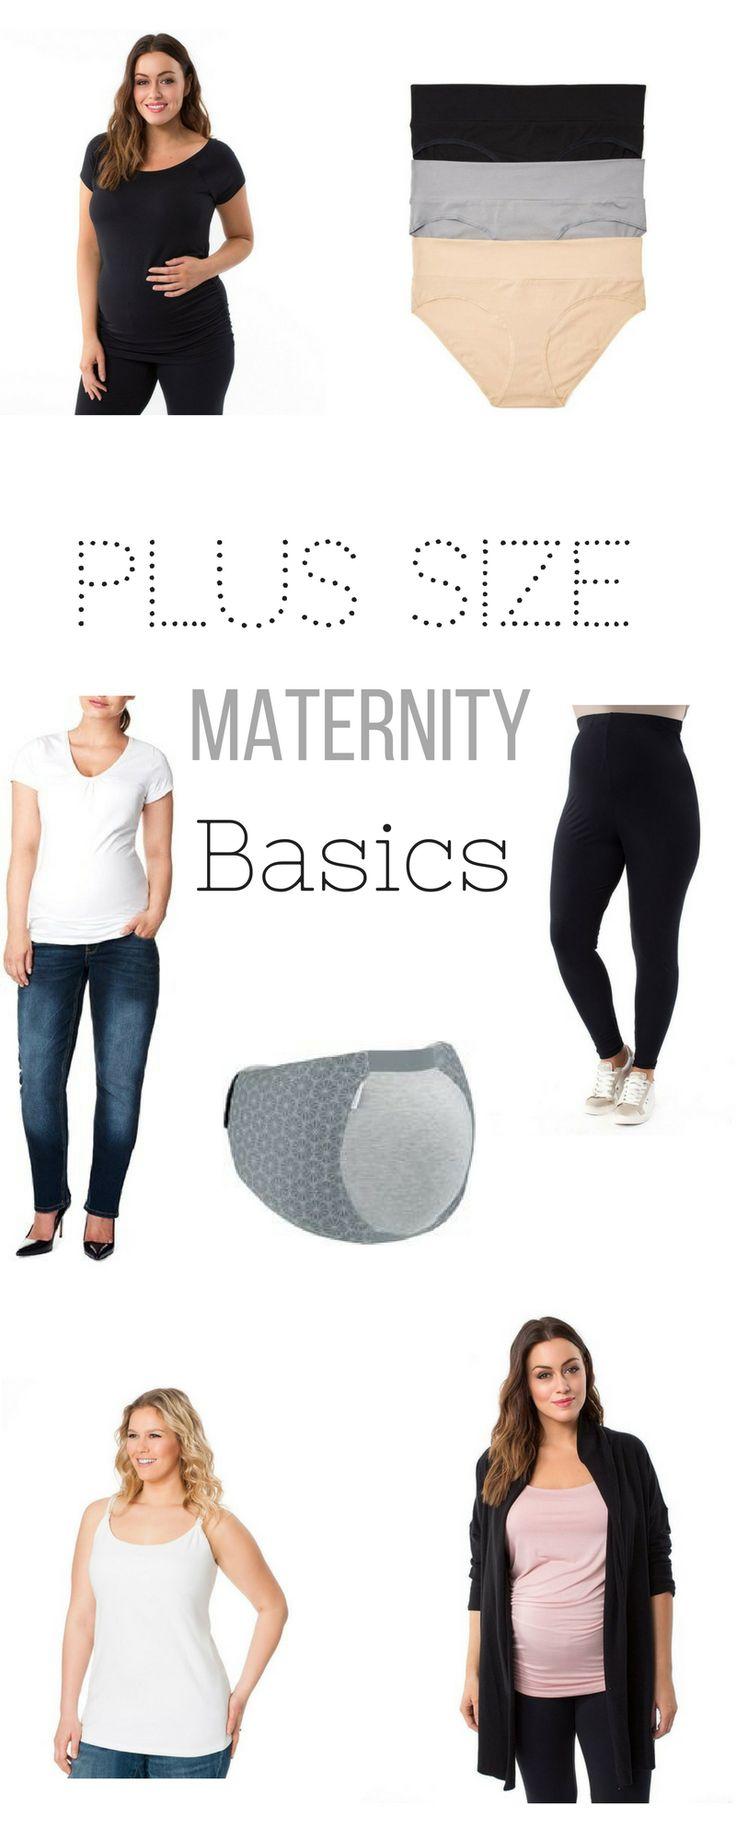 Plus size pregnancy, plus size fashion, plus size maternity clothes, plus size maternity, pregnancy plus size #affiliate